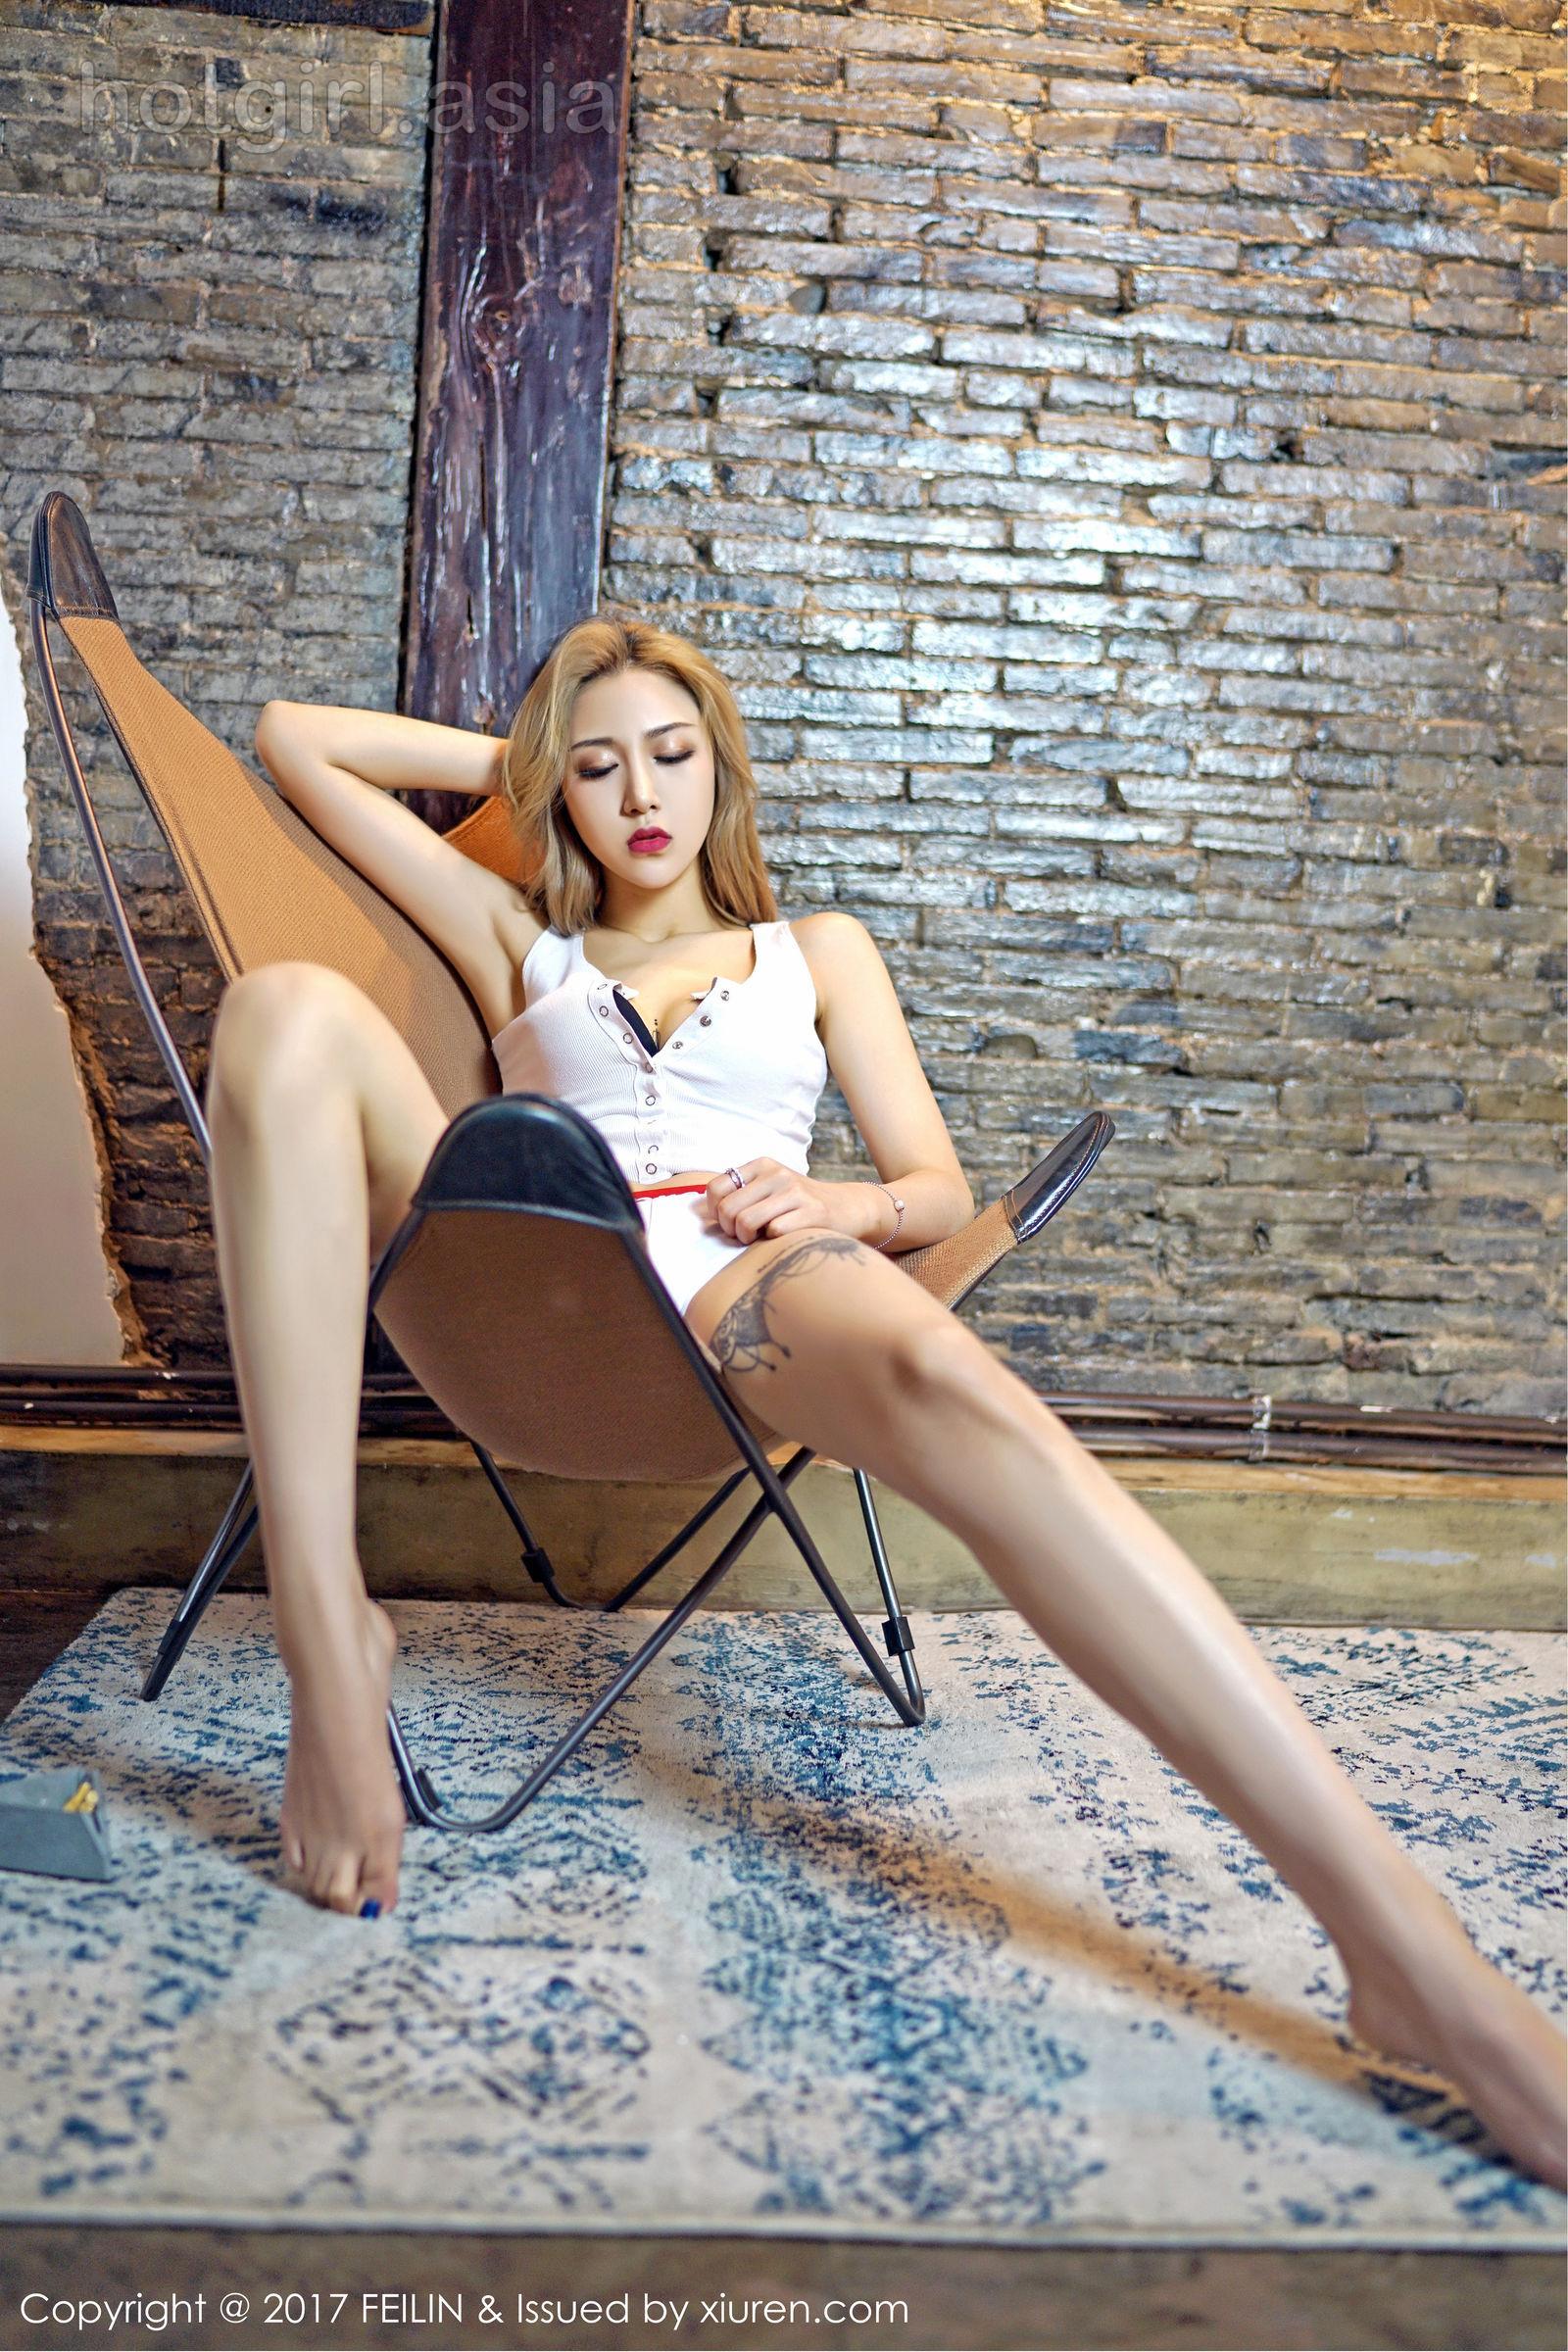 [FEILIN 囲 囡囡] VOL.108 Model @ 晗 大 Via Sexy Set